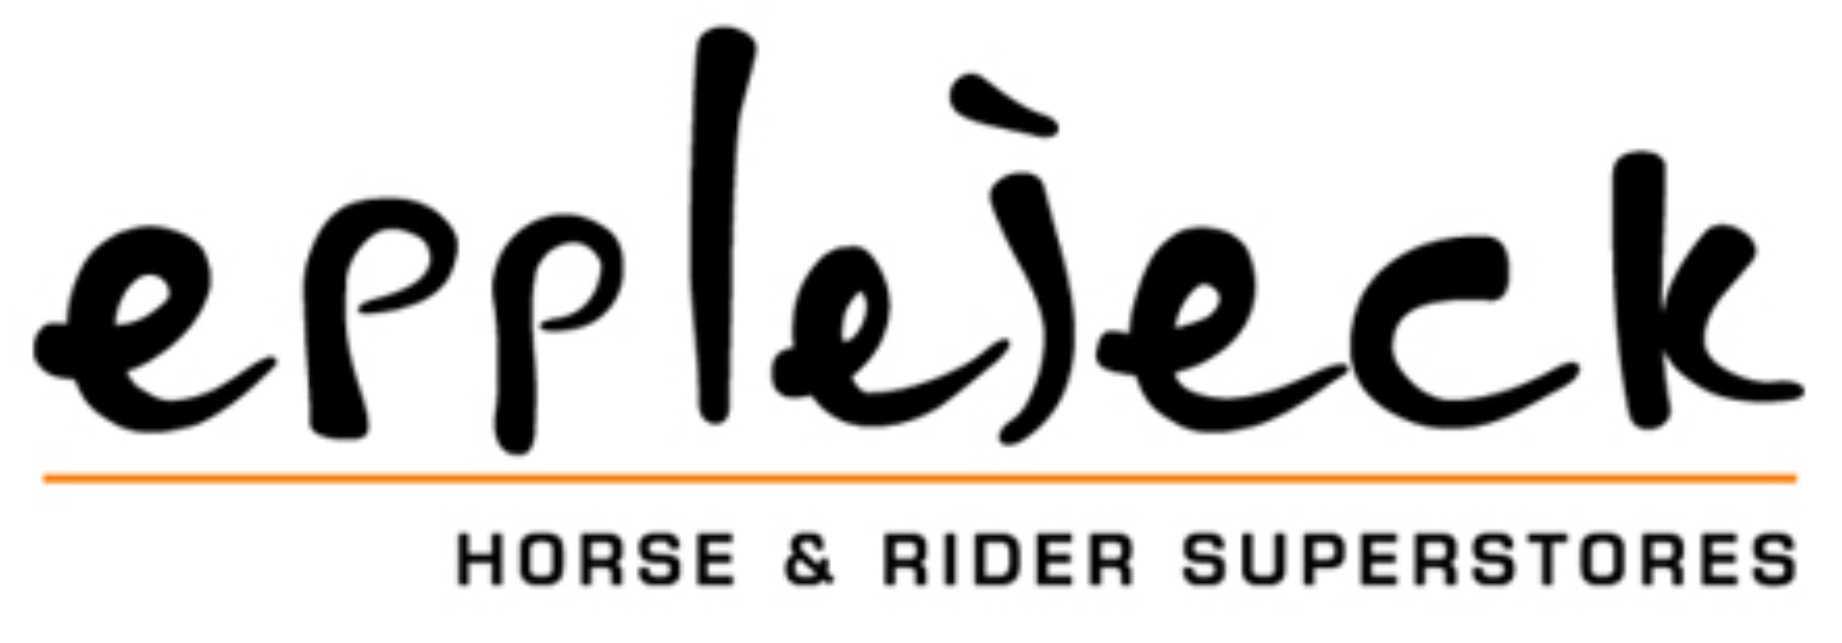 Epplejeck Logo